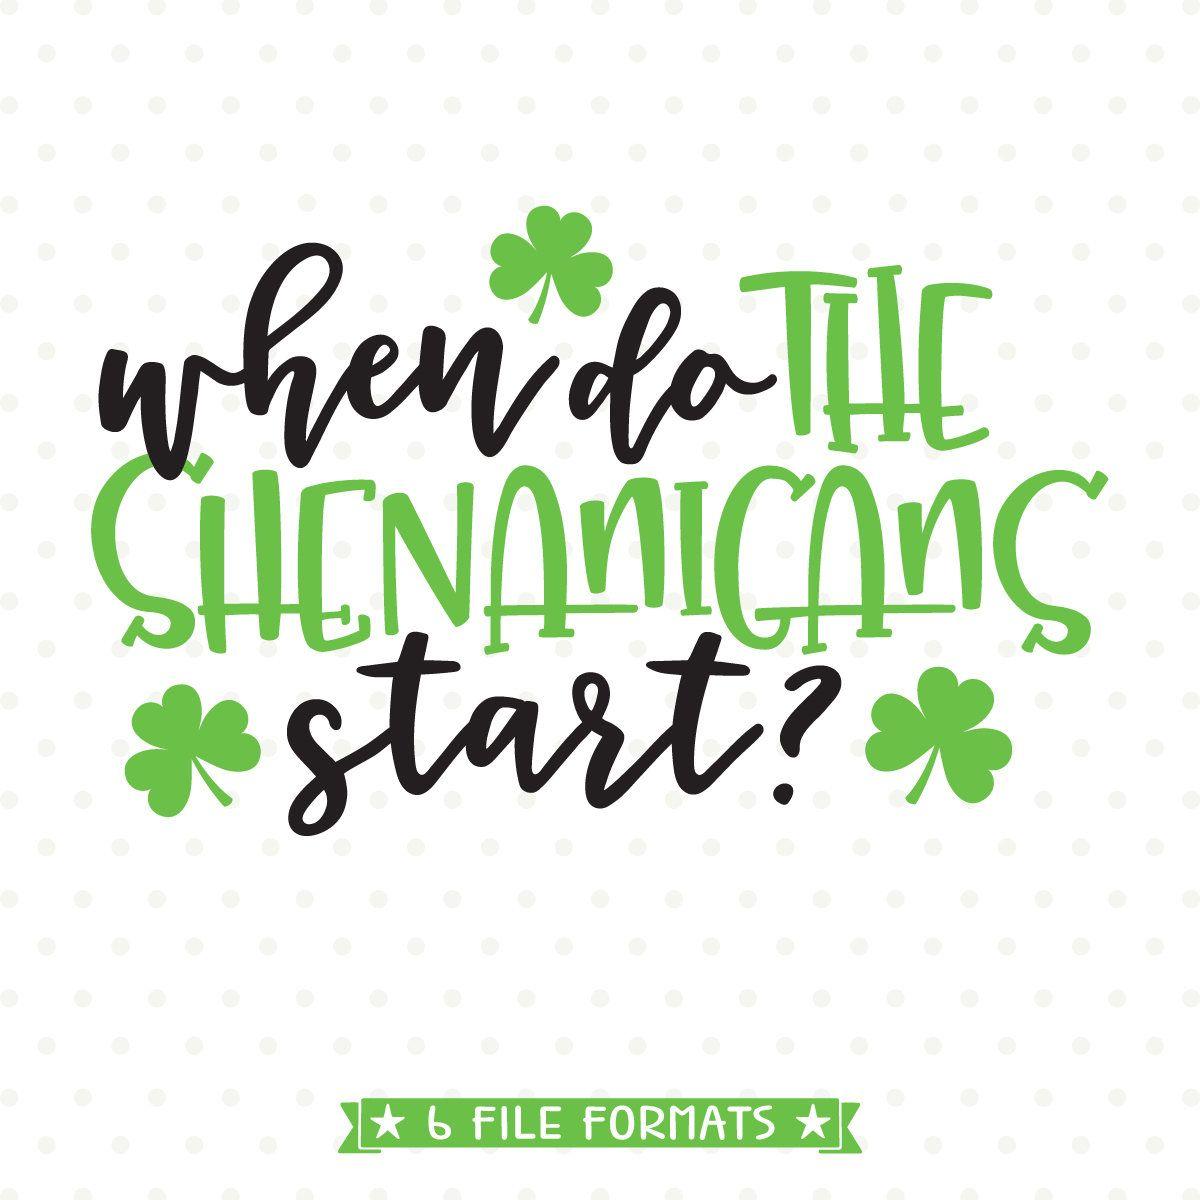 St Patricks Day Svg When Do The Shenanigans Start Svg File Etsy St Patricks Day Quotes St Patricks Day Clipart St Patrick Day Shirts